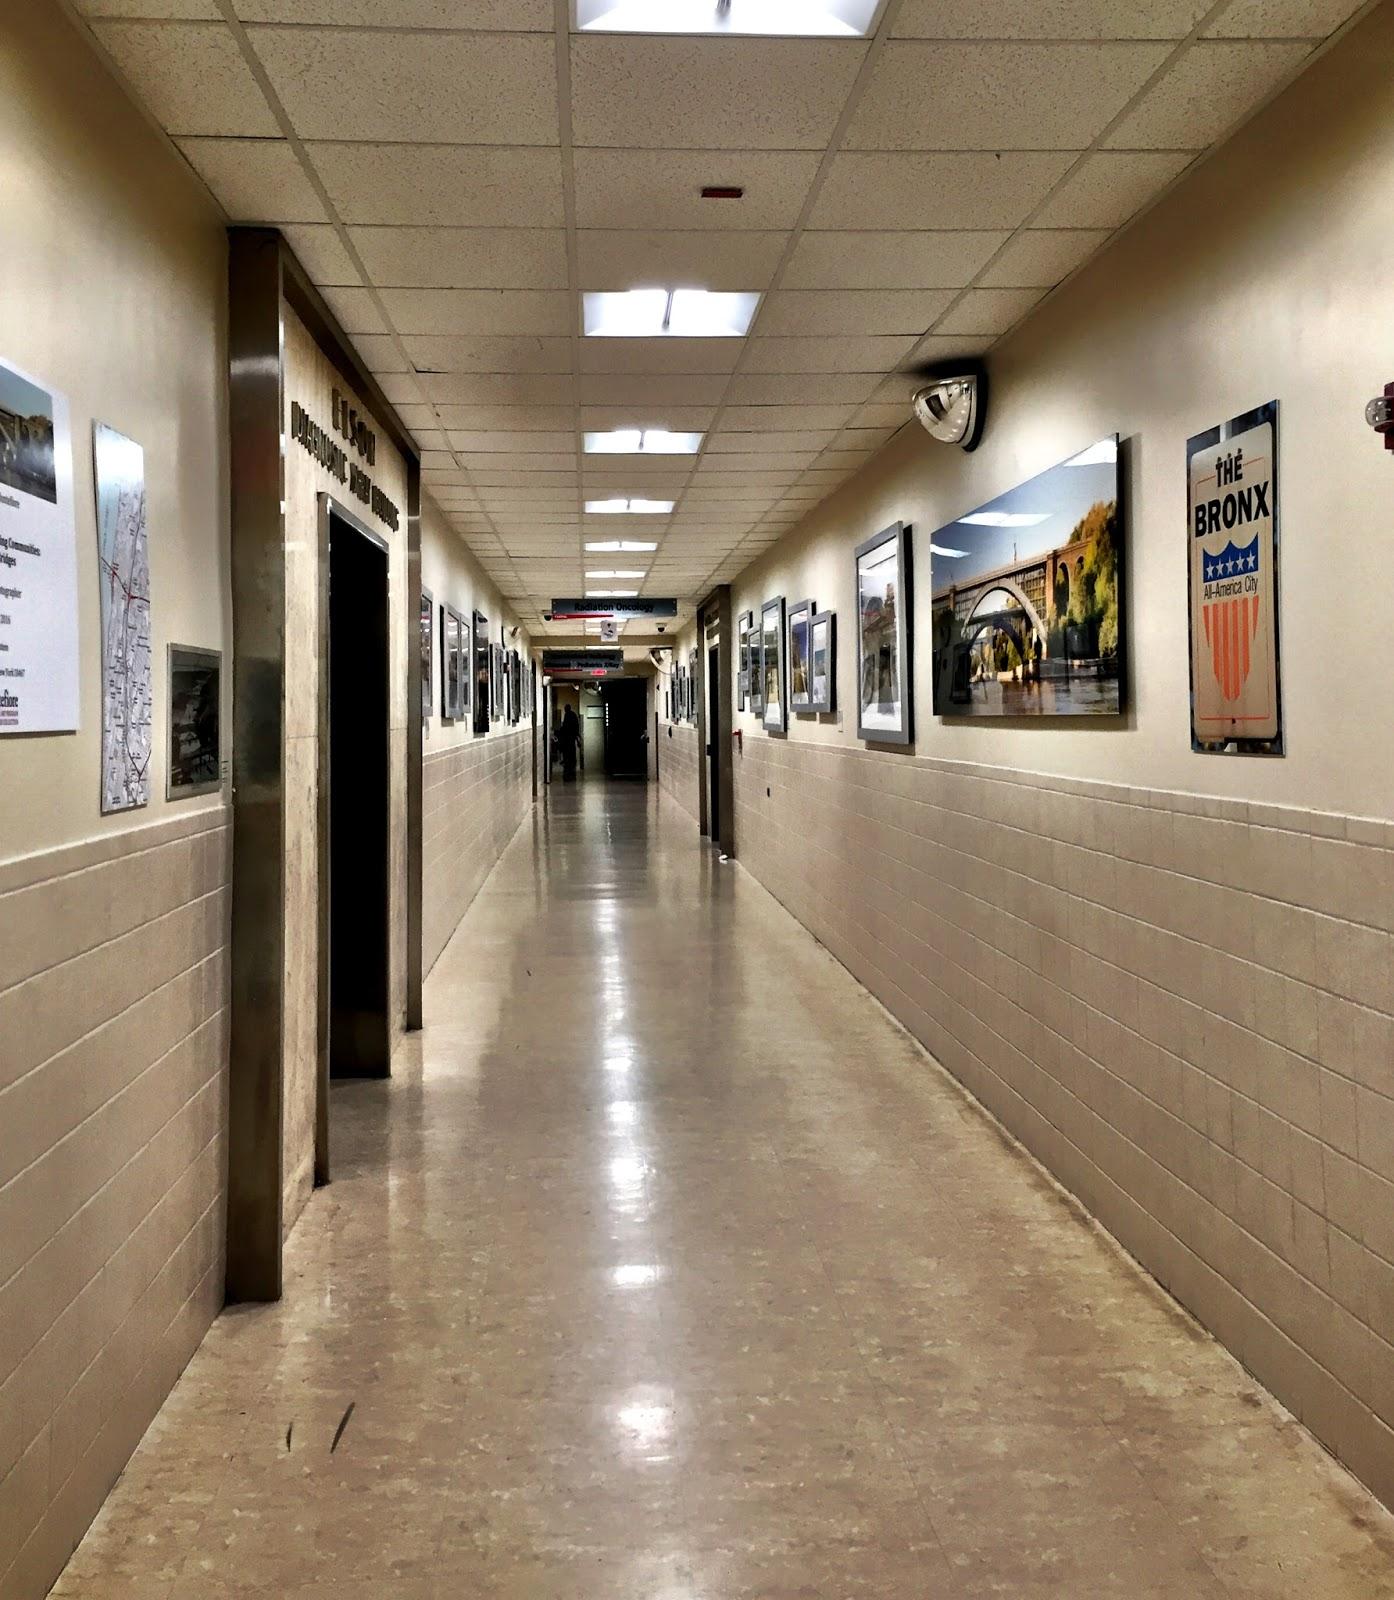 Montefiore Moses Emergency Room